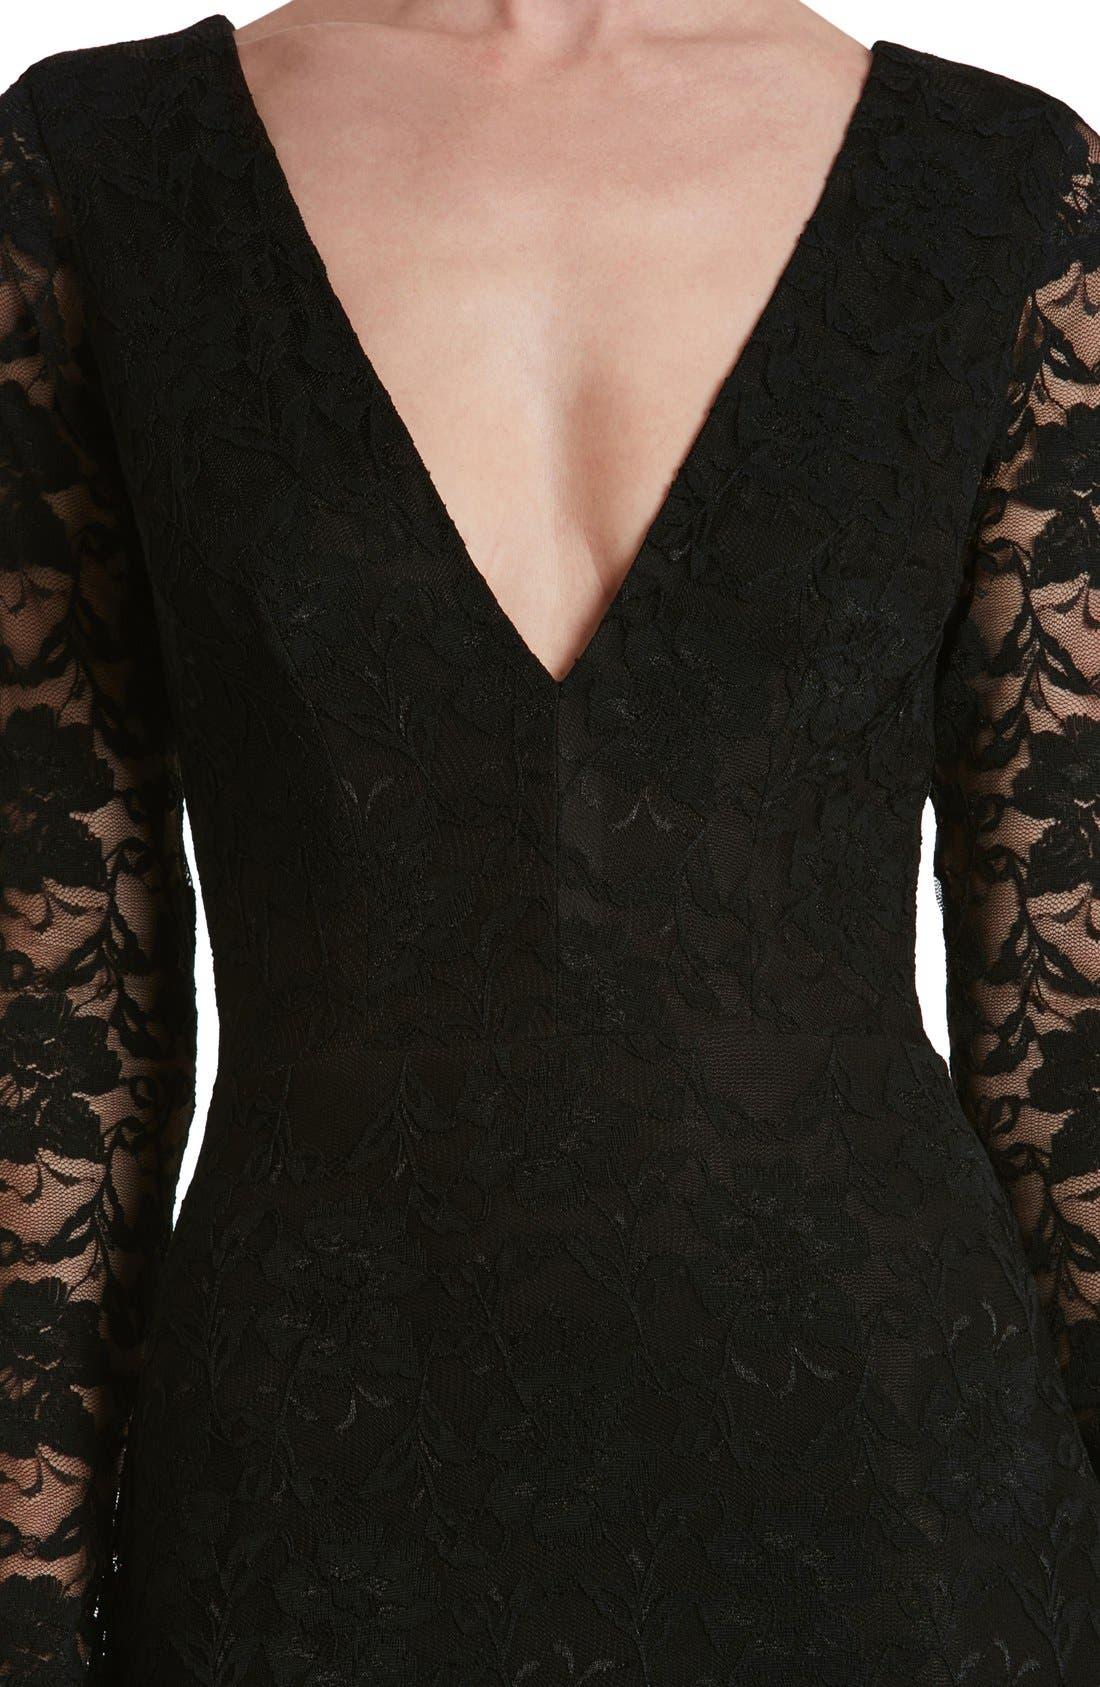 'Erica' Plunge Neck Lace Body-Con Dress,                             Alternate thumbnail 5, color,                             008